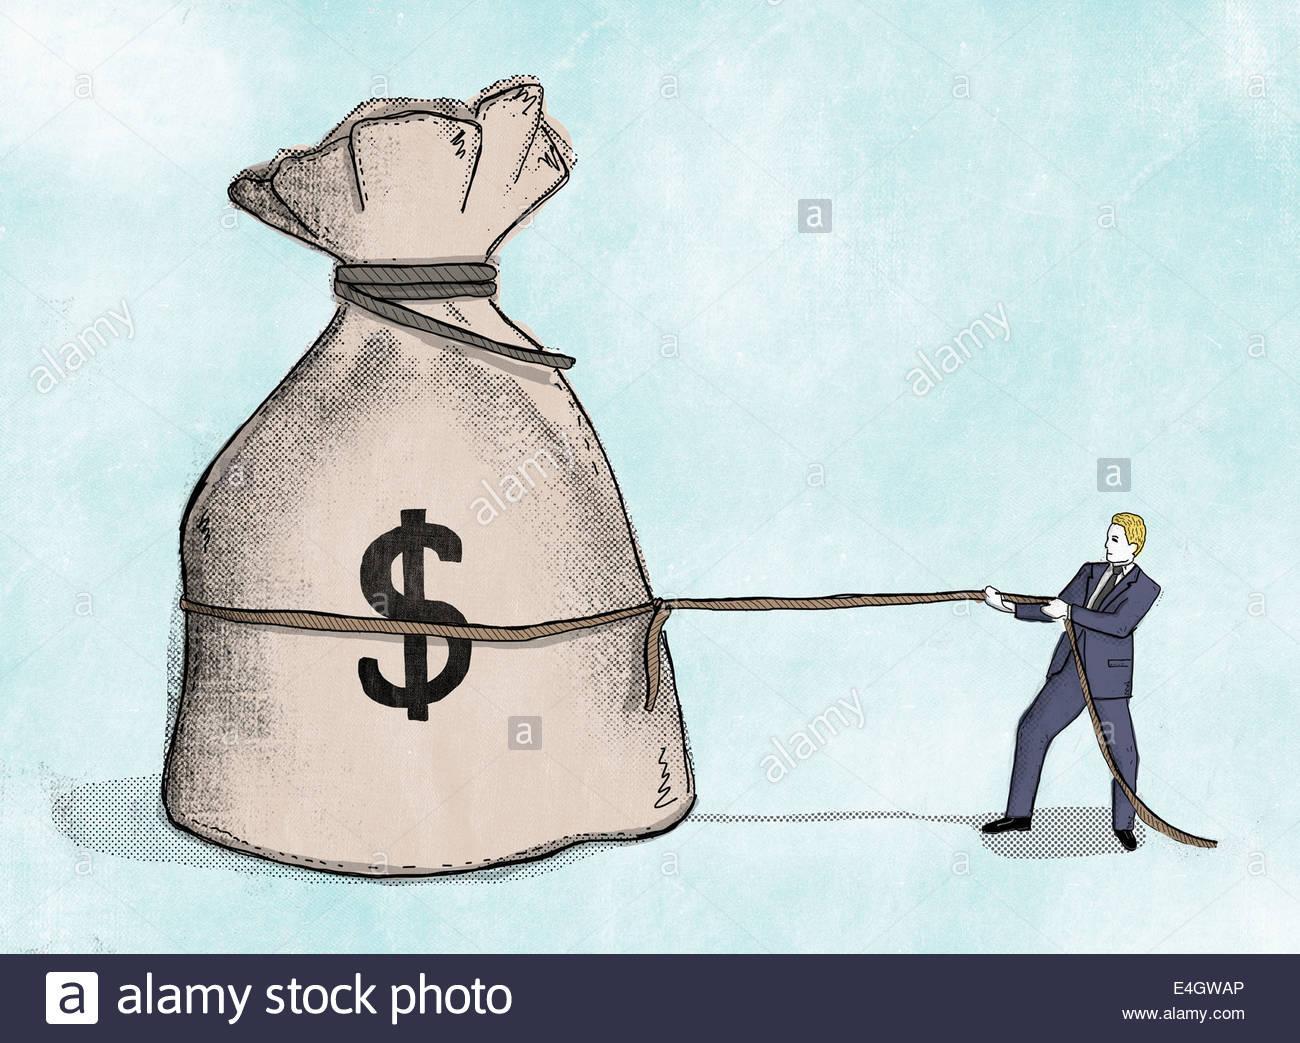 Businessman pulling at rope around large dollar sign money bag - Stock Image